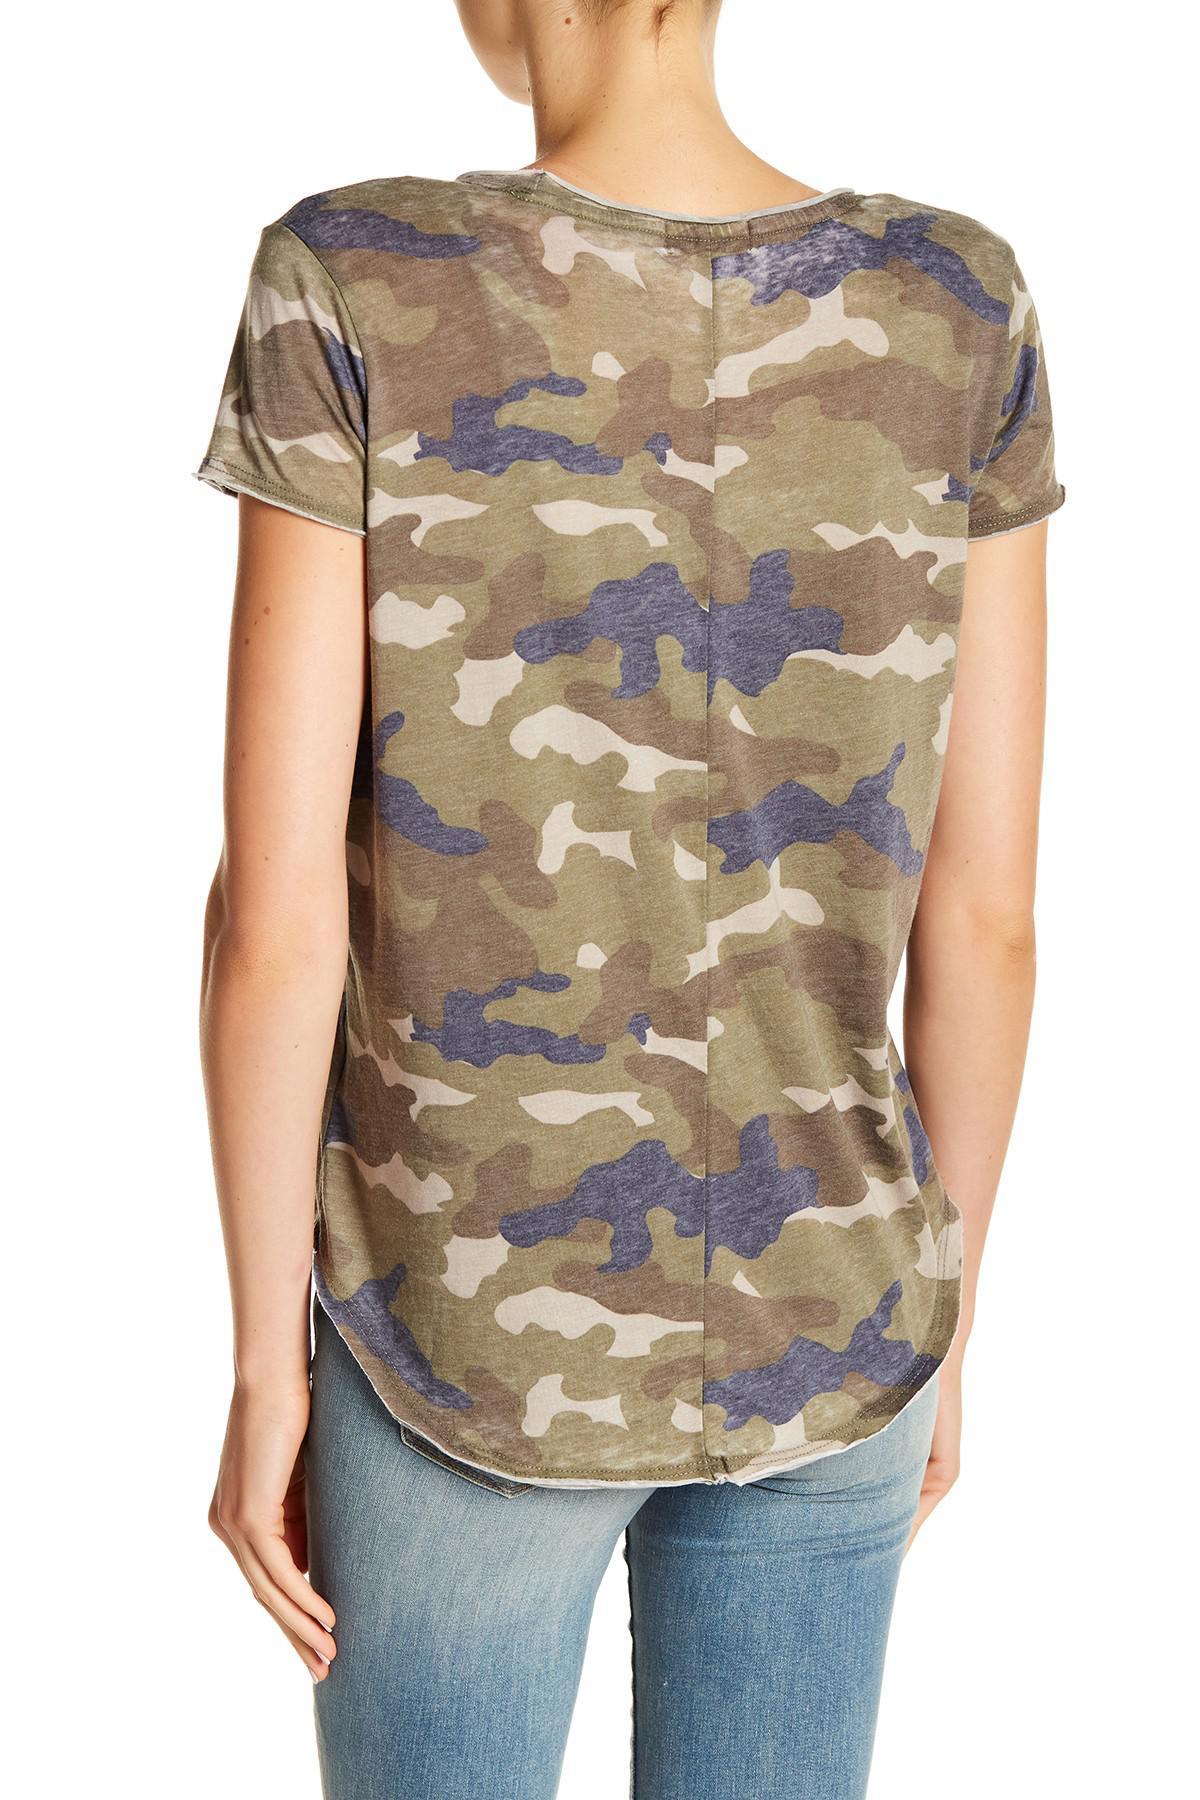 86bd9ddbce7 Lyst - William Rast Stardust Shine Camo Graphic Shirt in Green